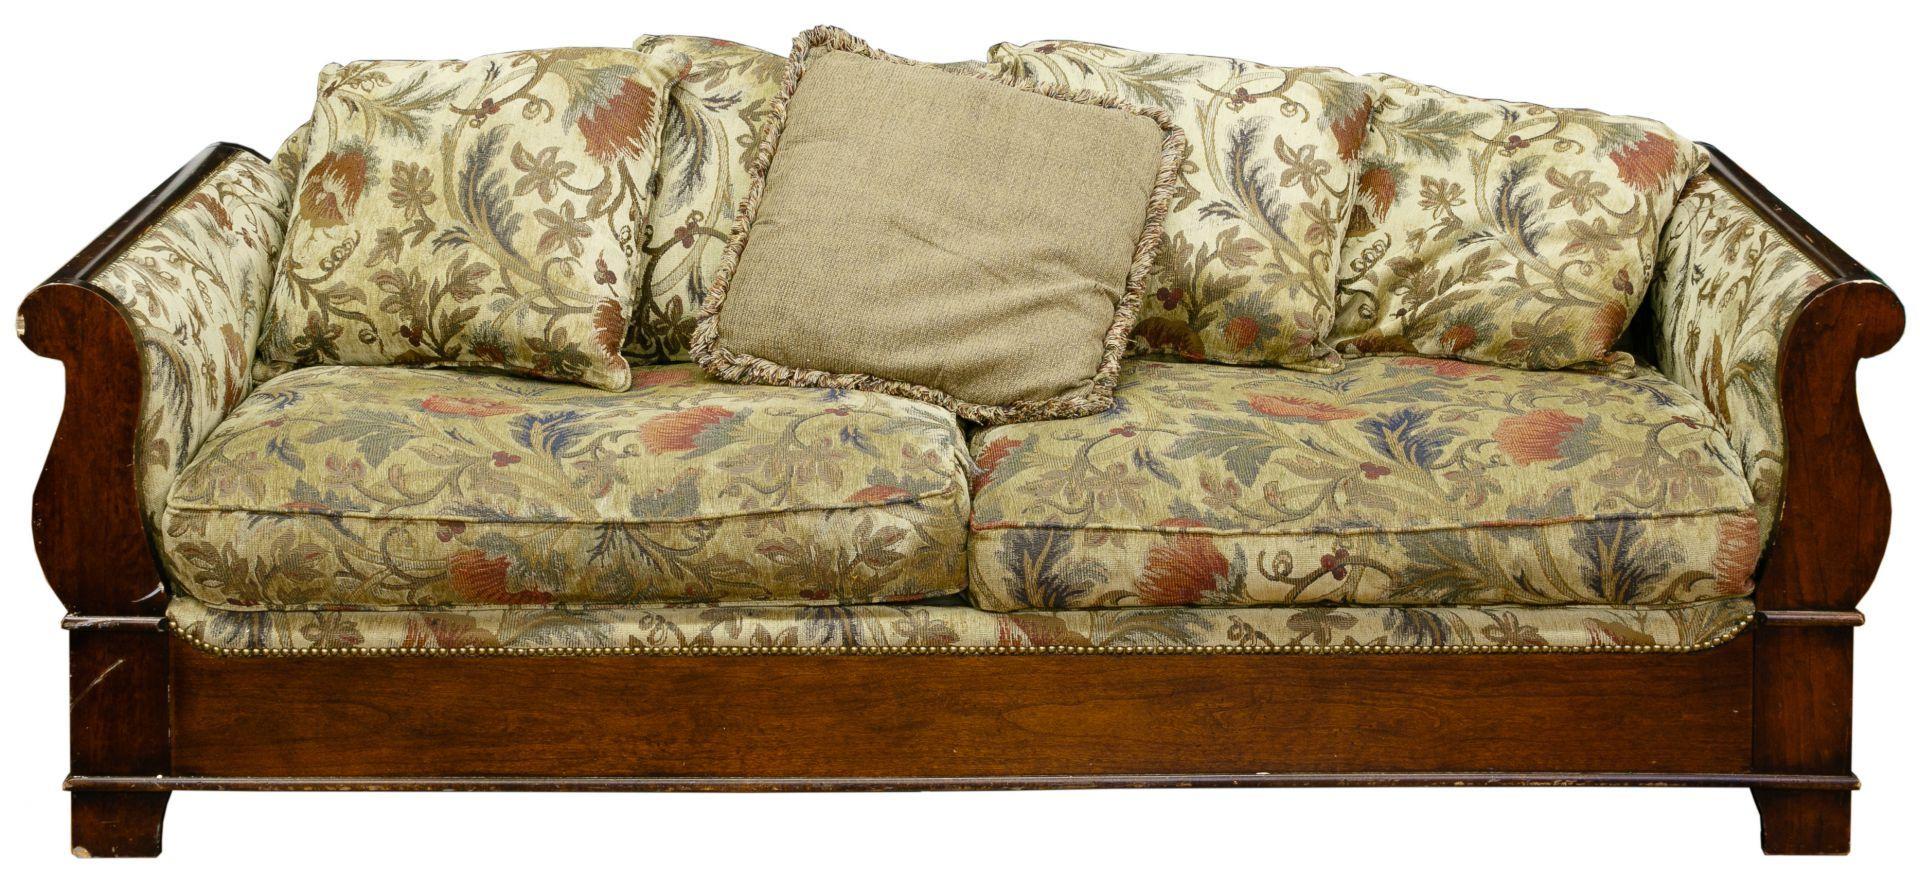 Lot mahogany frame upholstered sofa twocushion seat having